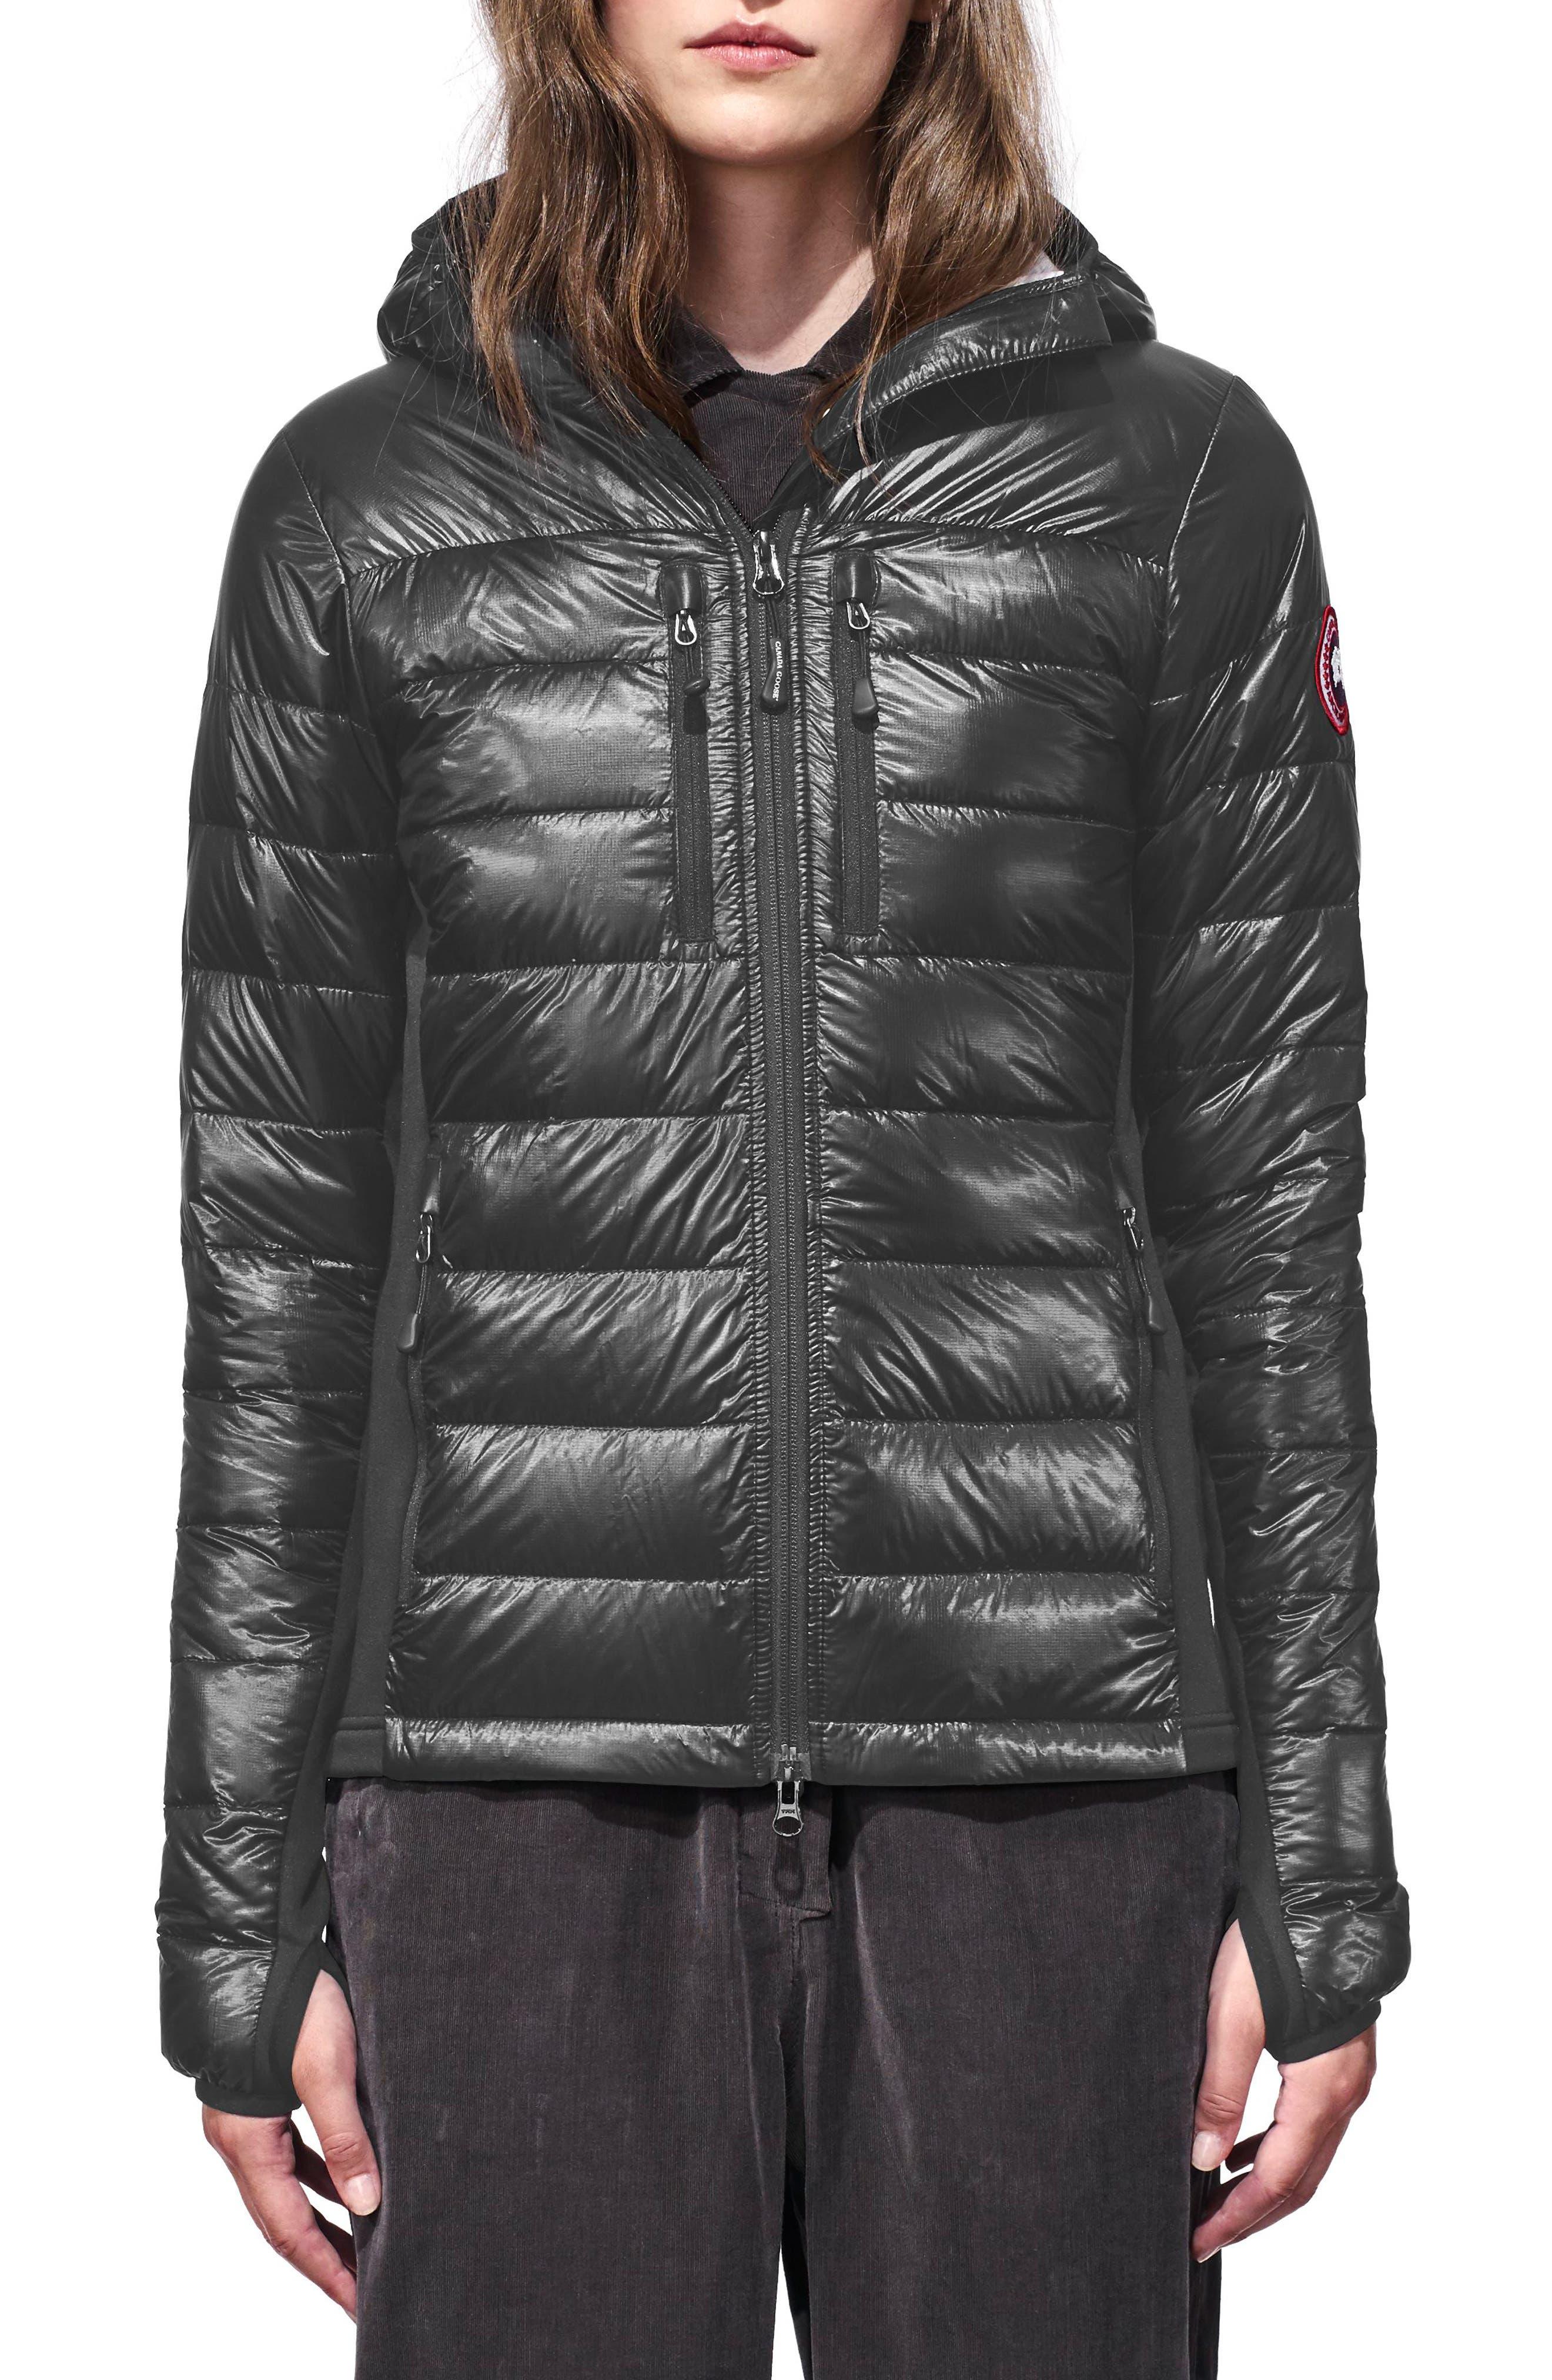 CANADA GOOSE 'Hybridge Lite' Slim Fit Hooded Packable Down Jacket, Main, color, S GRAPHITE/ L BLACK